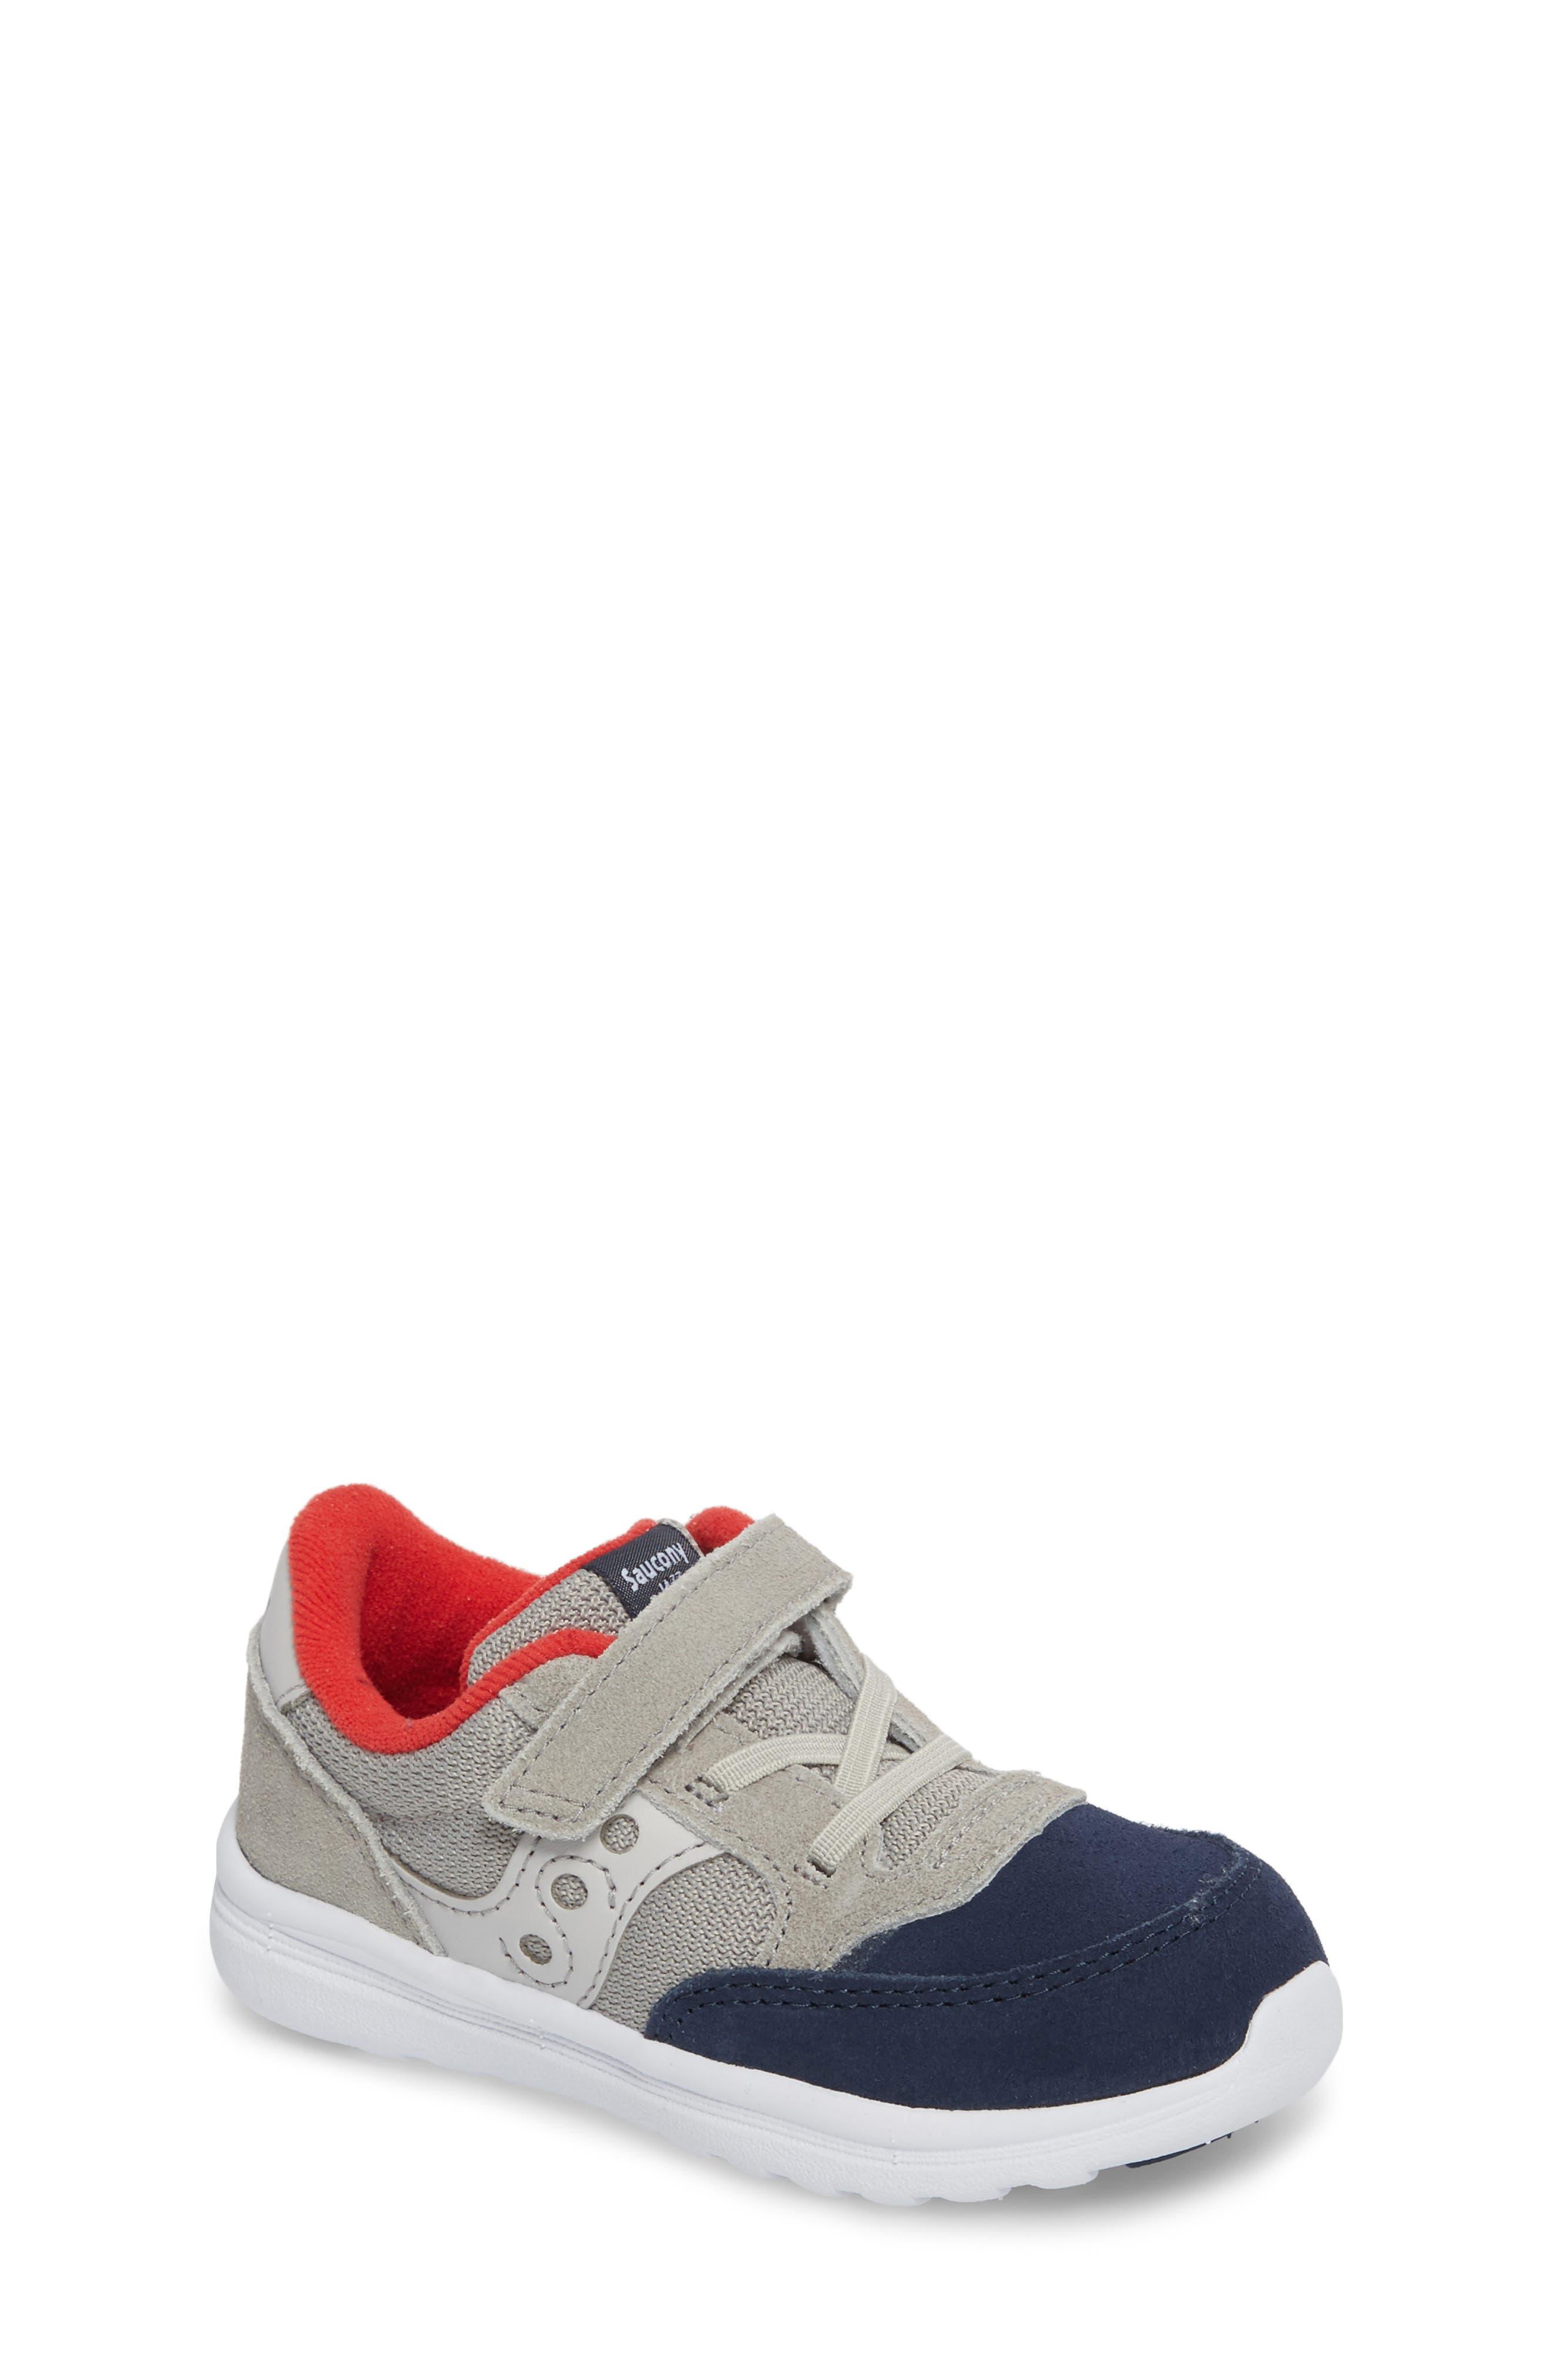 Jazz Lite Sneaker,                         Main,                         color, 020